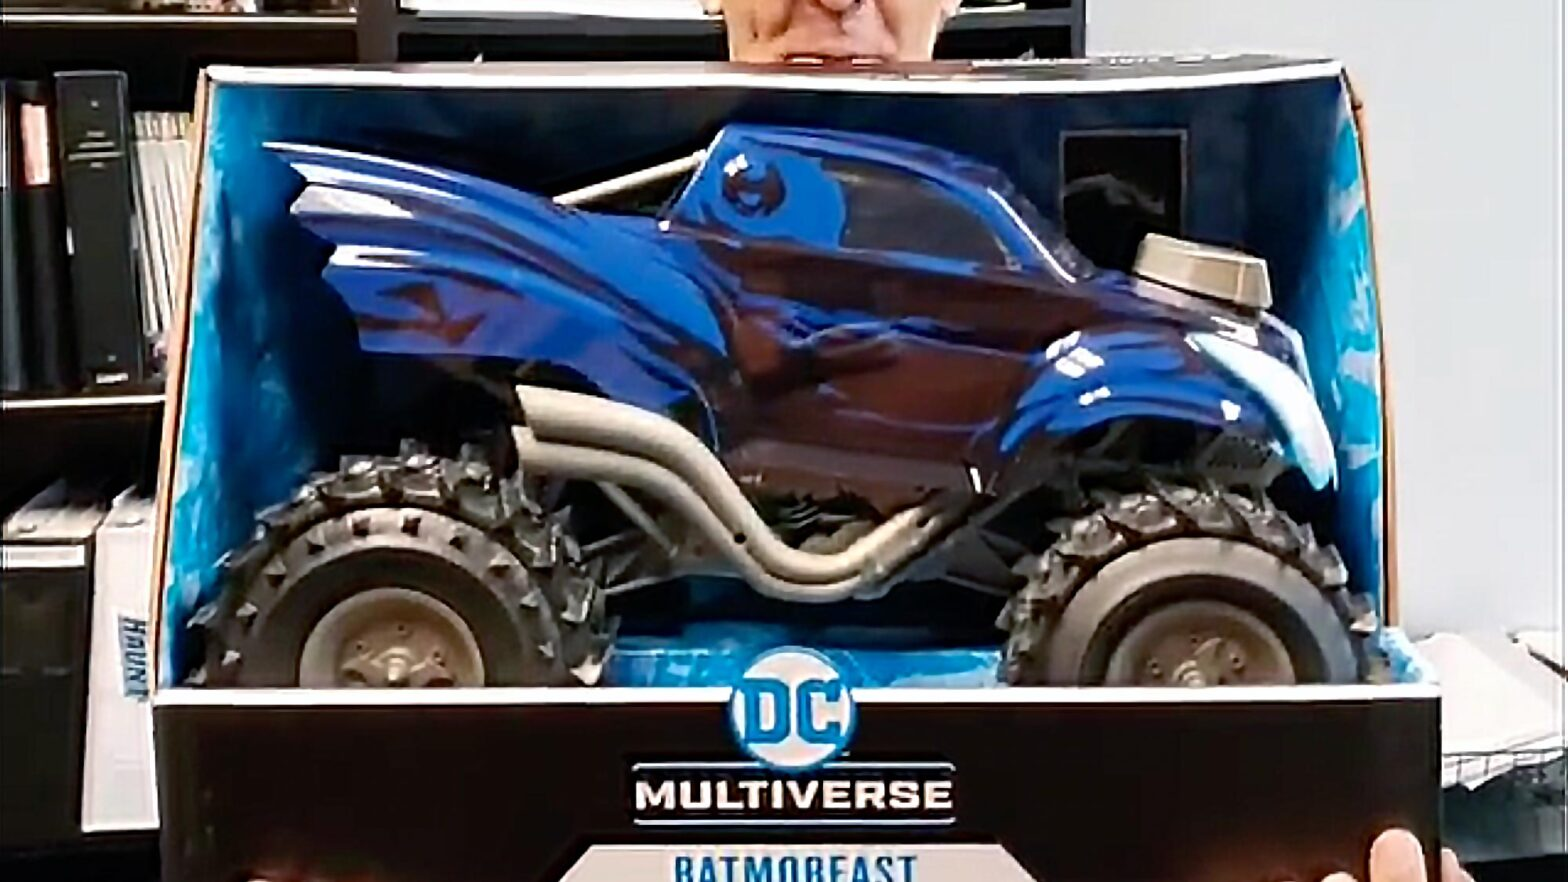 "McFarlane DC Multiverse 7"" Scale Batmobeast Toy"